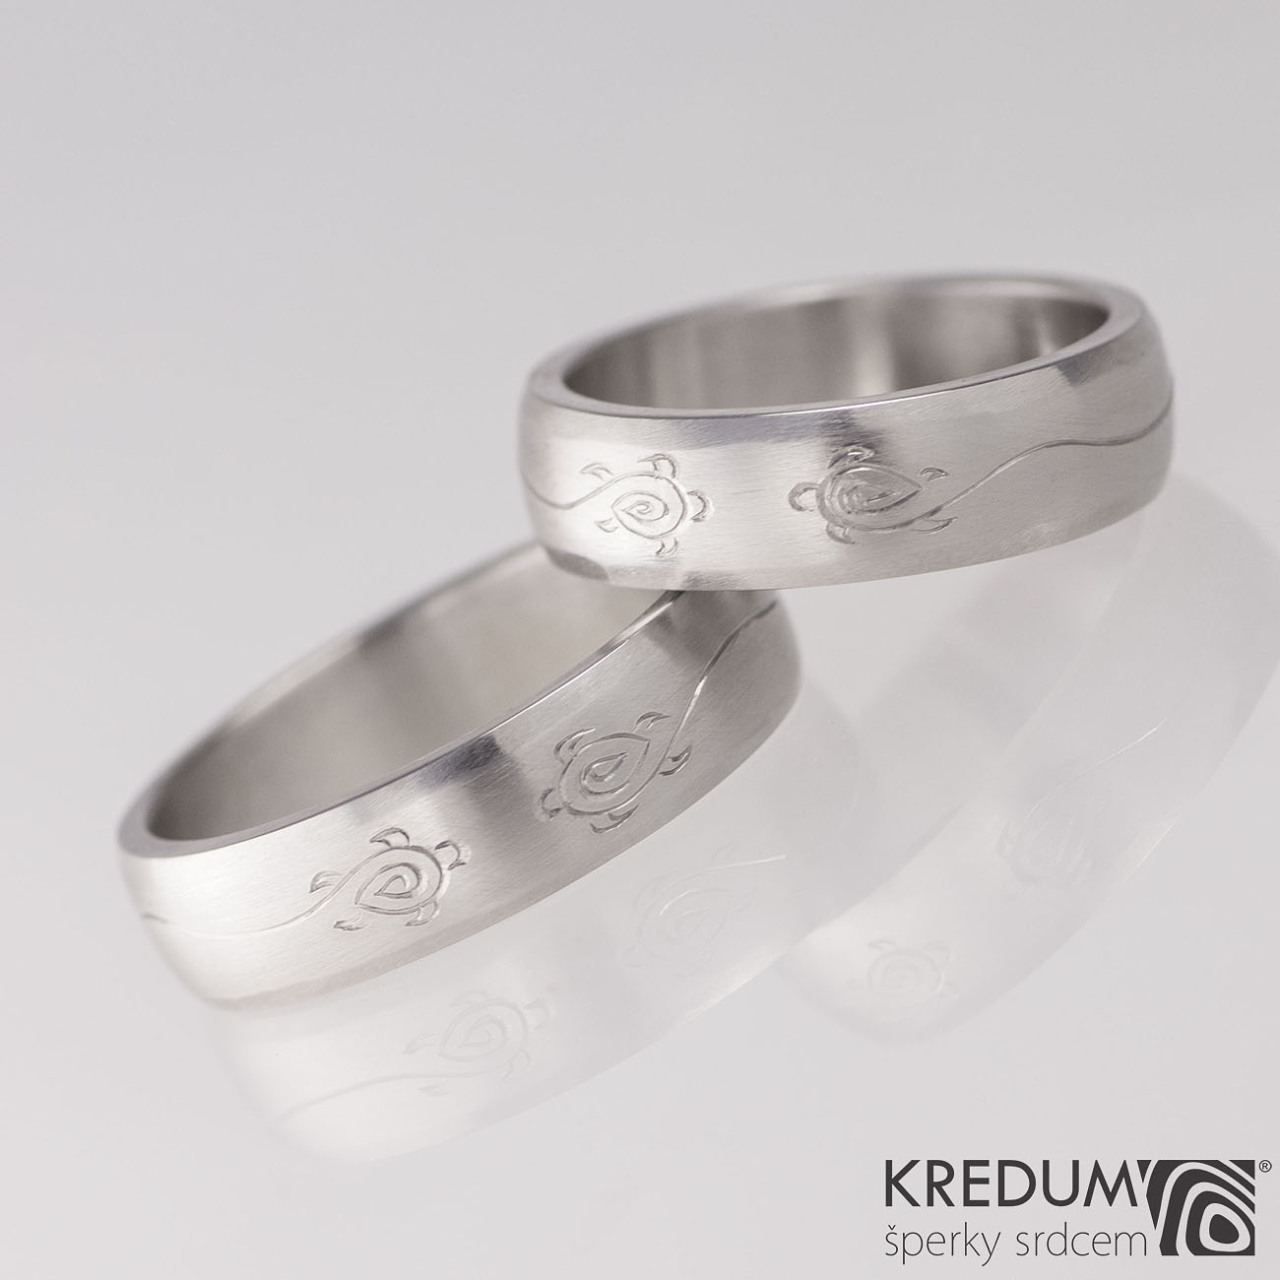 Ryti Obrazku Rucni Vyroba Hand Made Snubni Prsteny A Sperky Od